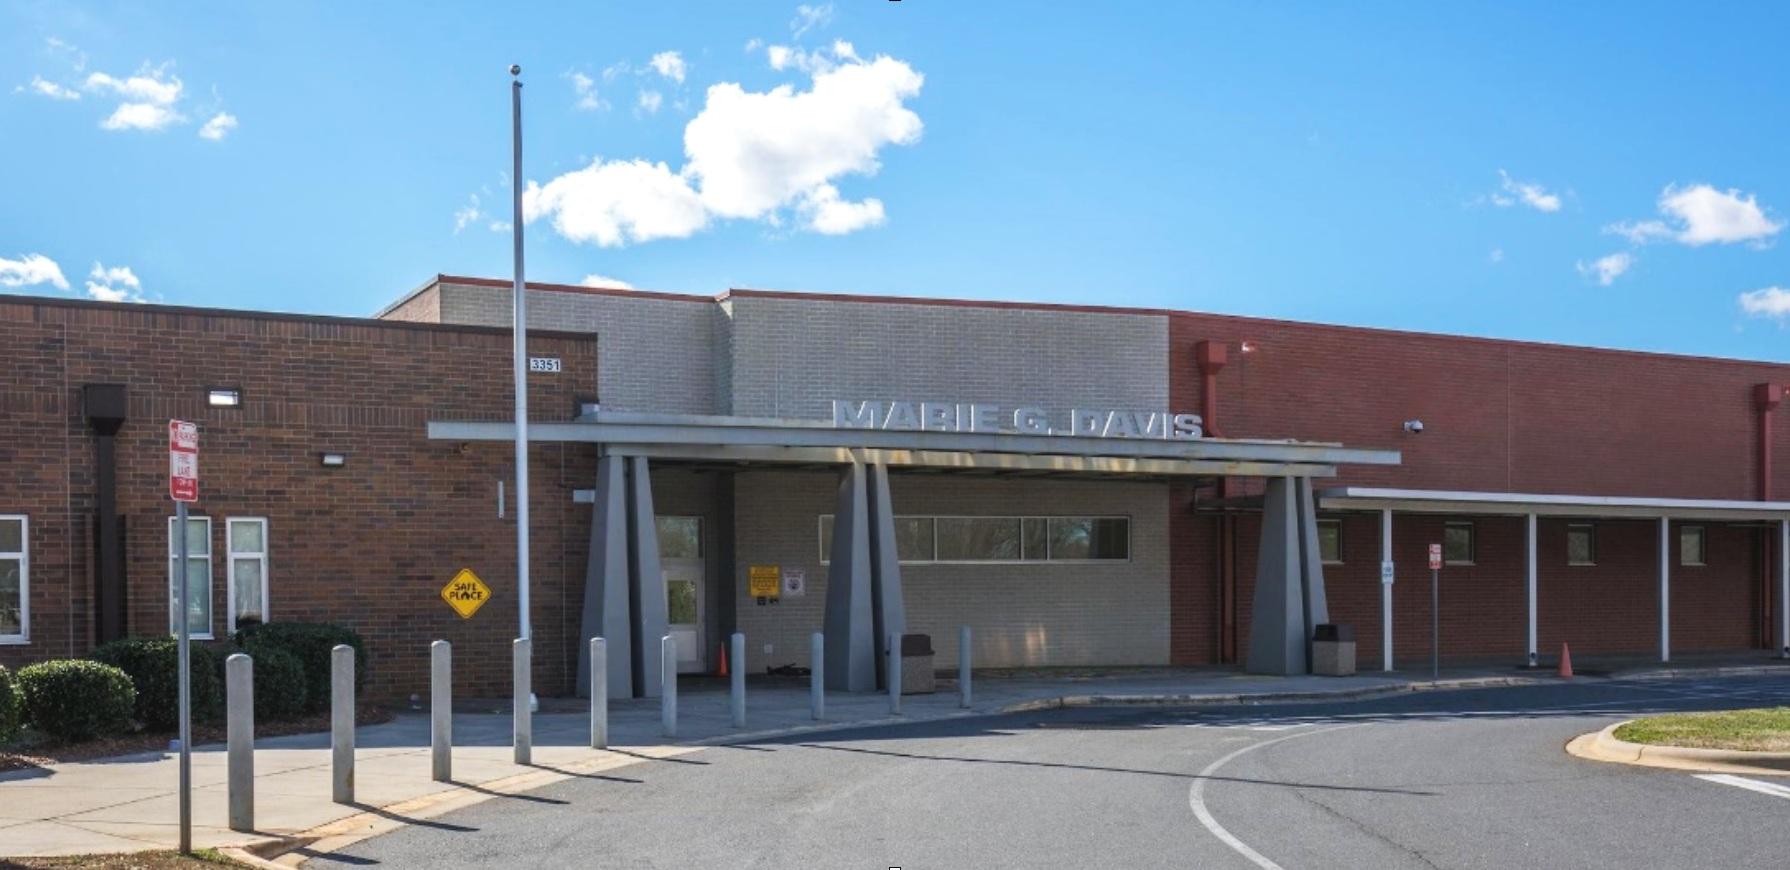 Marie G. Davis Elementary School